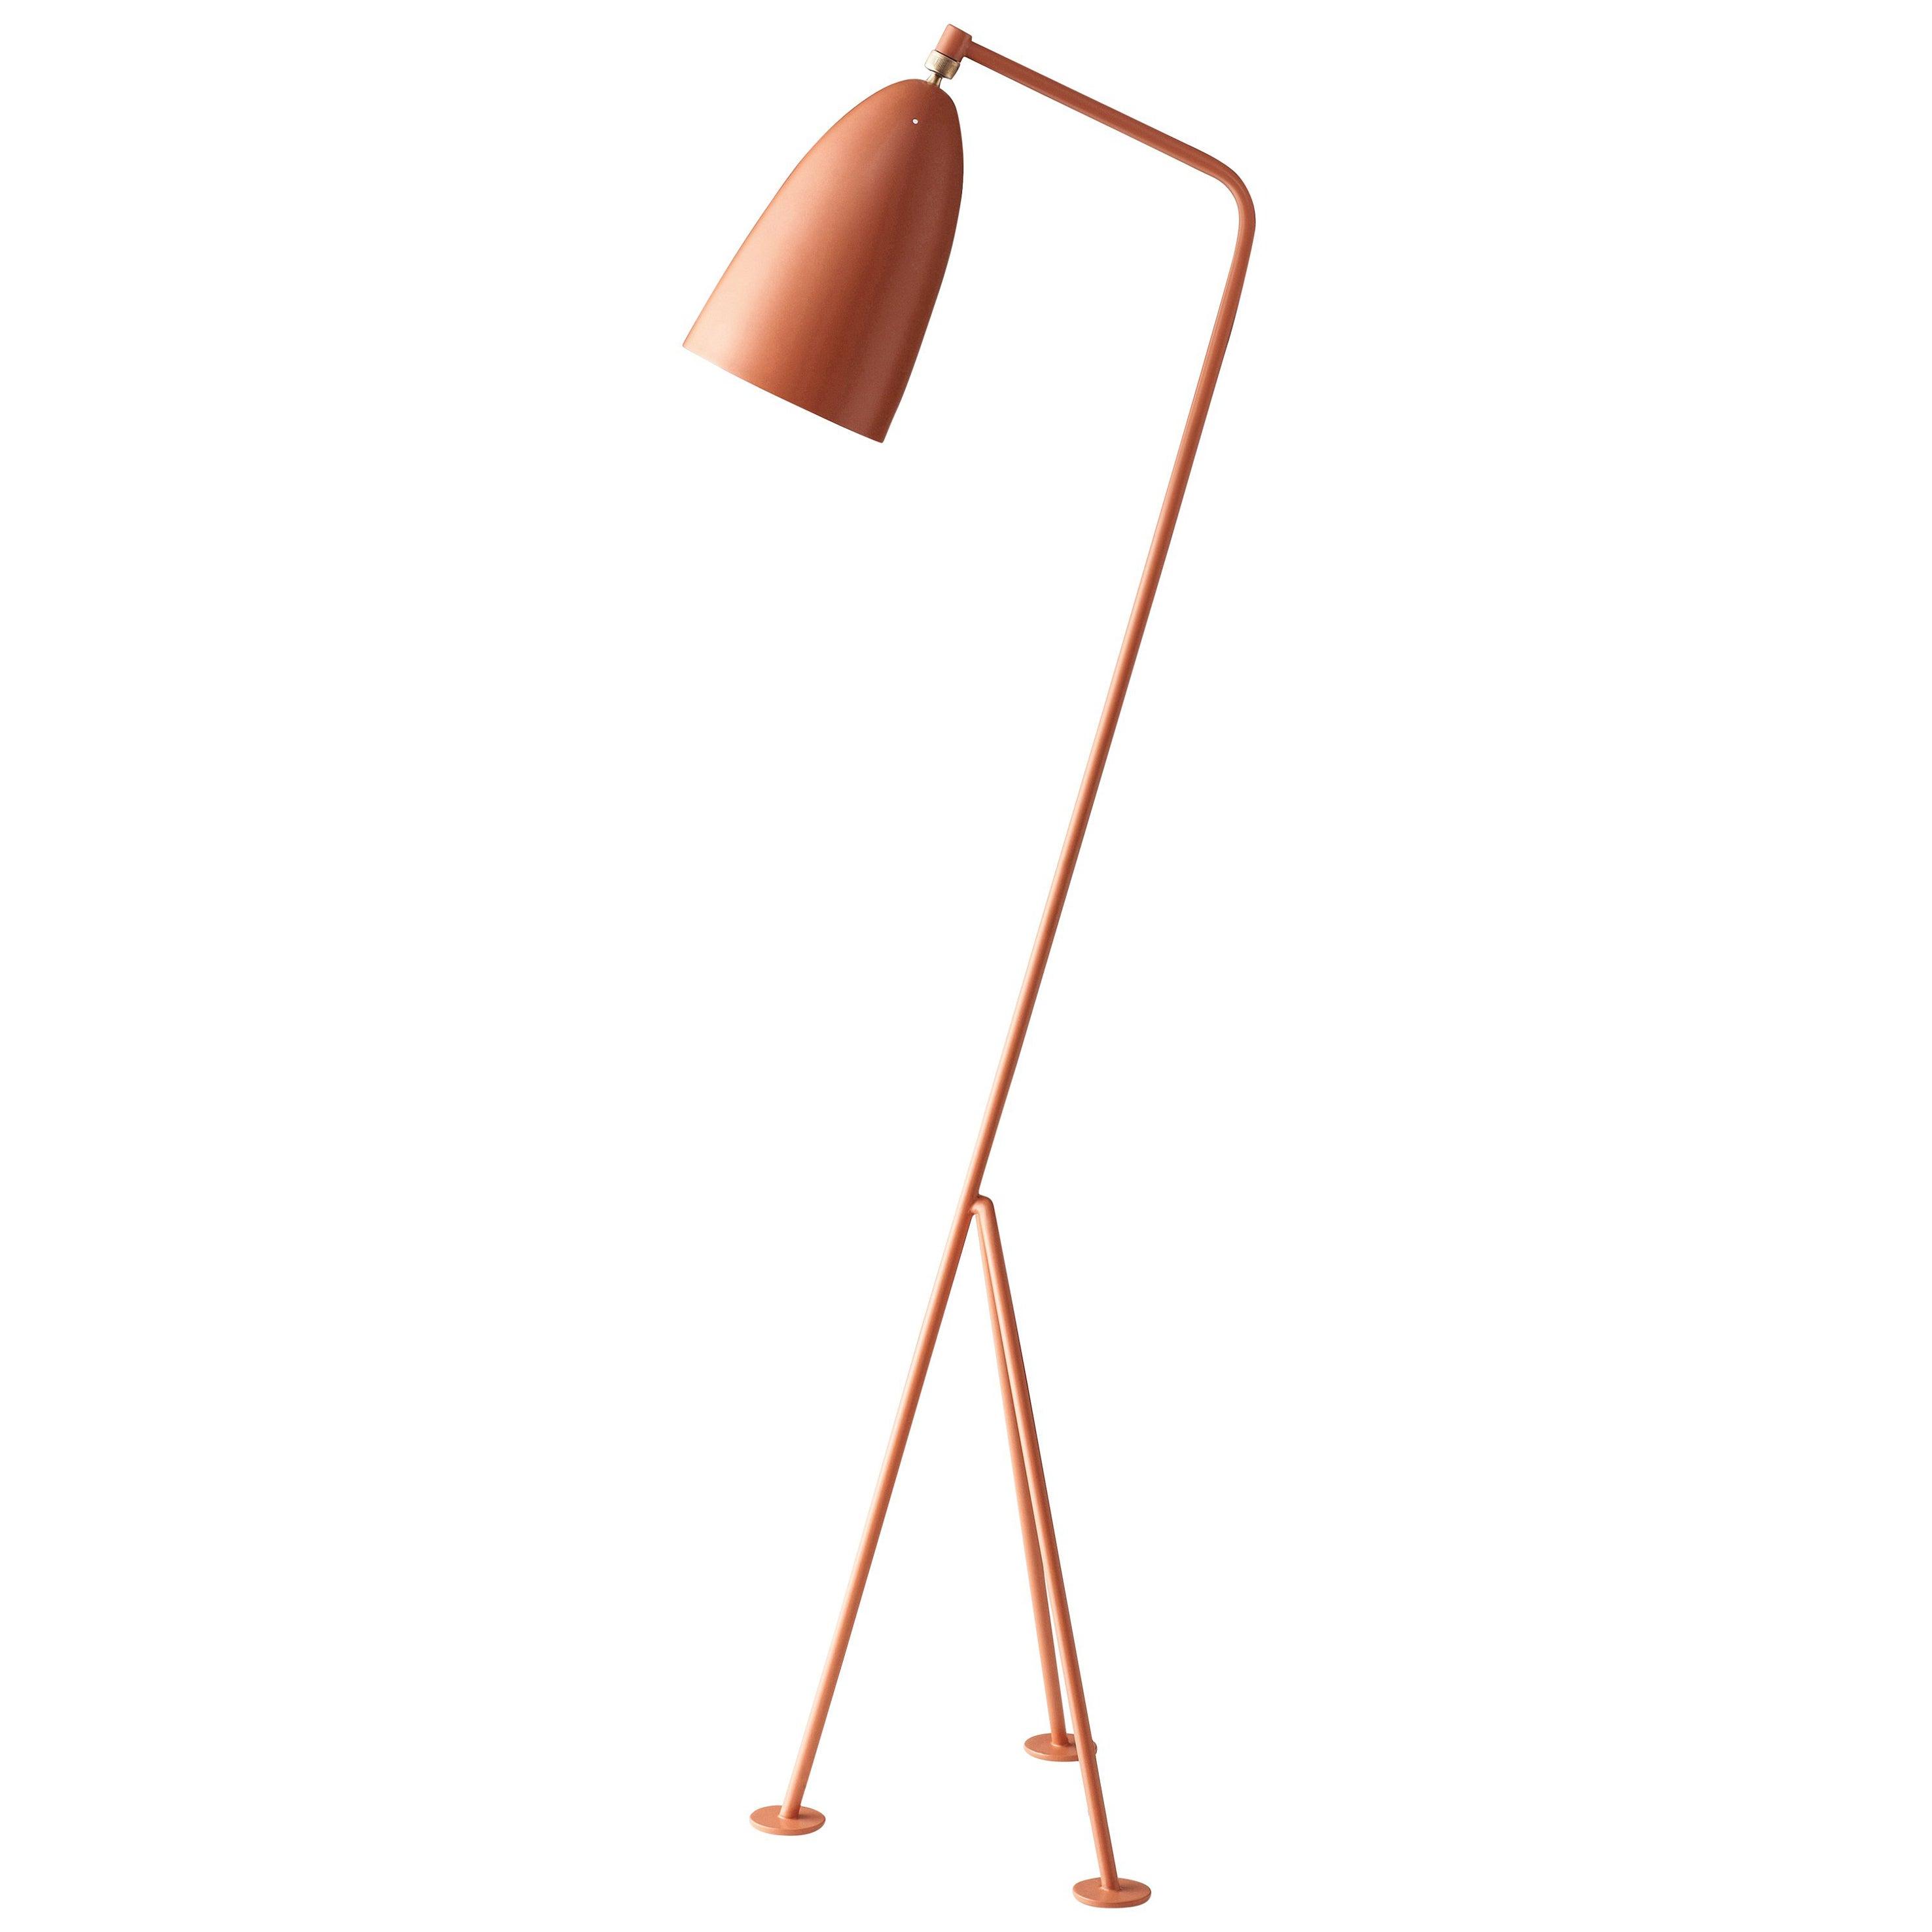 Greta Magnusson Grossman 'Grasshopper' Floor Lamp in Red